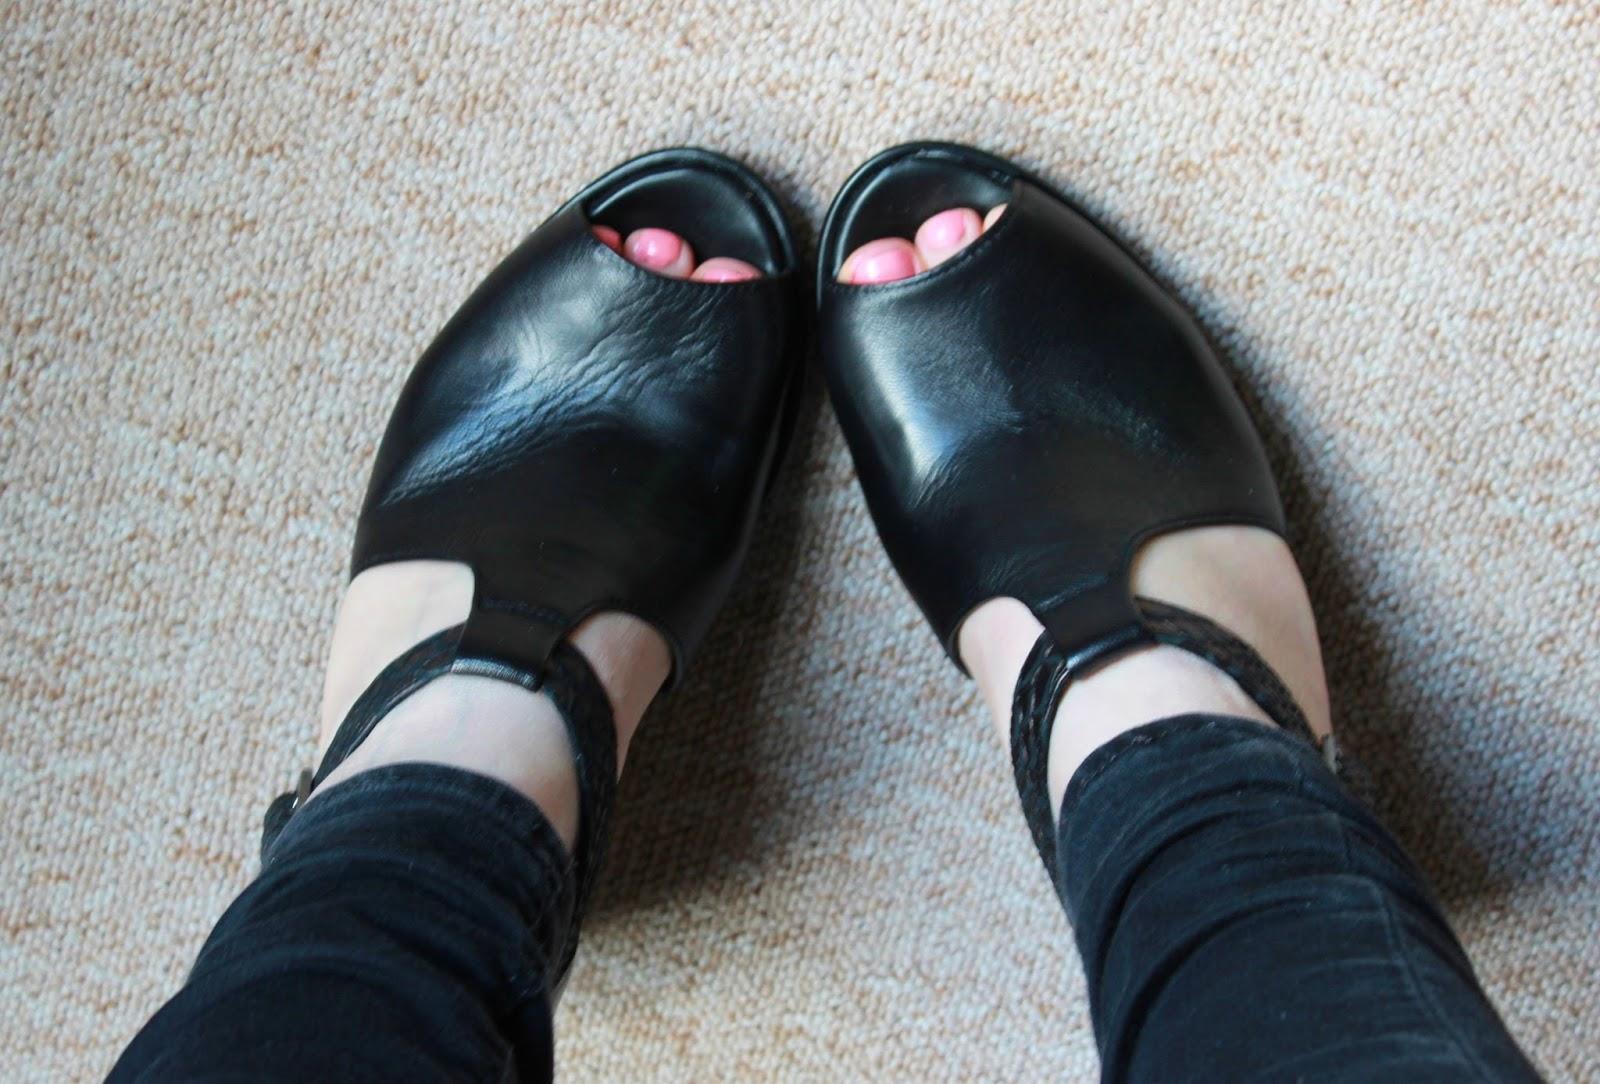 New Clarks Dulcie Meg shoes on feet